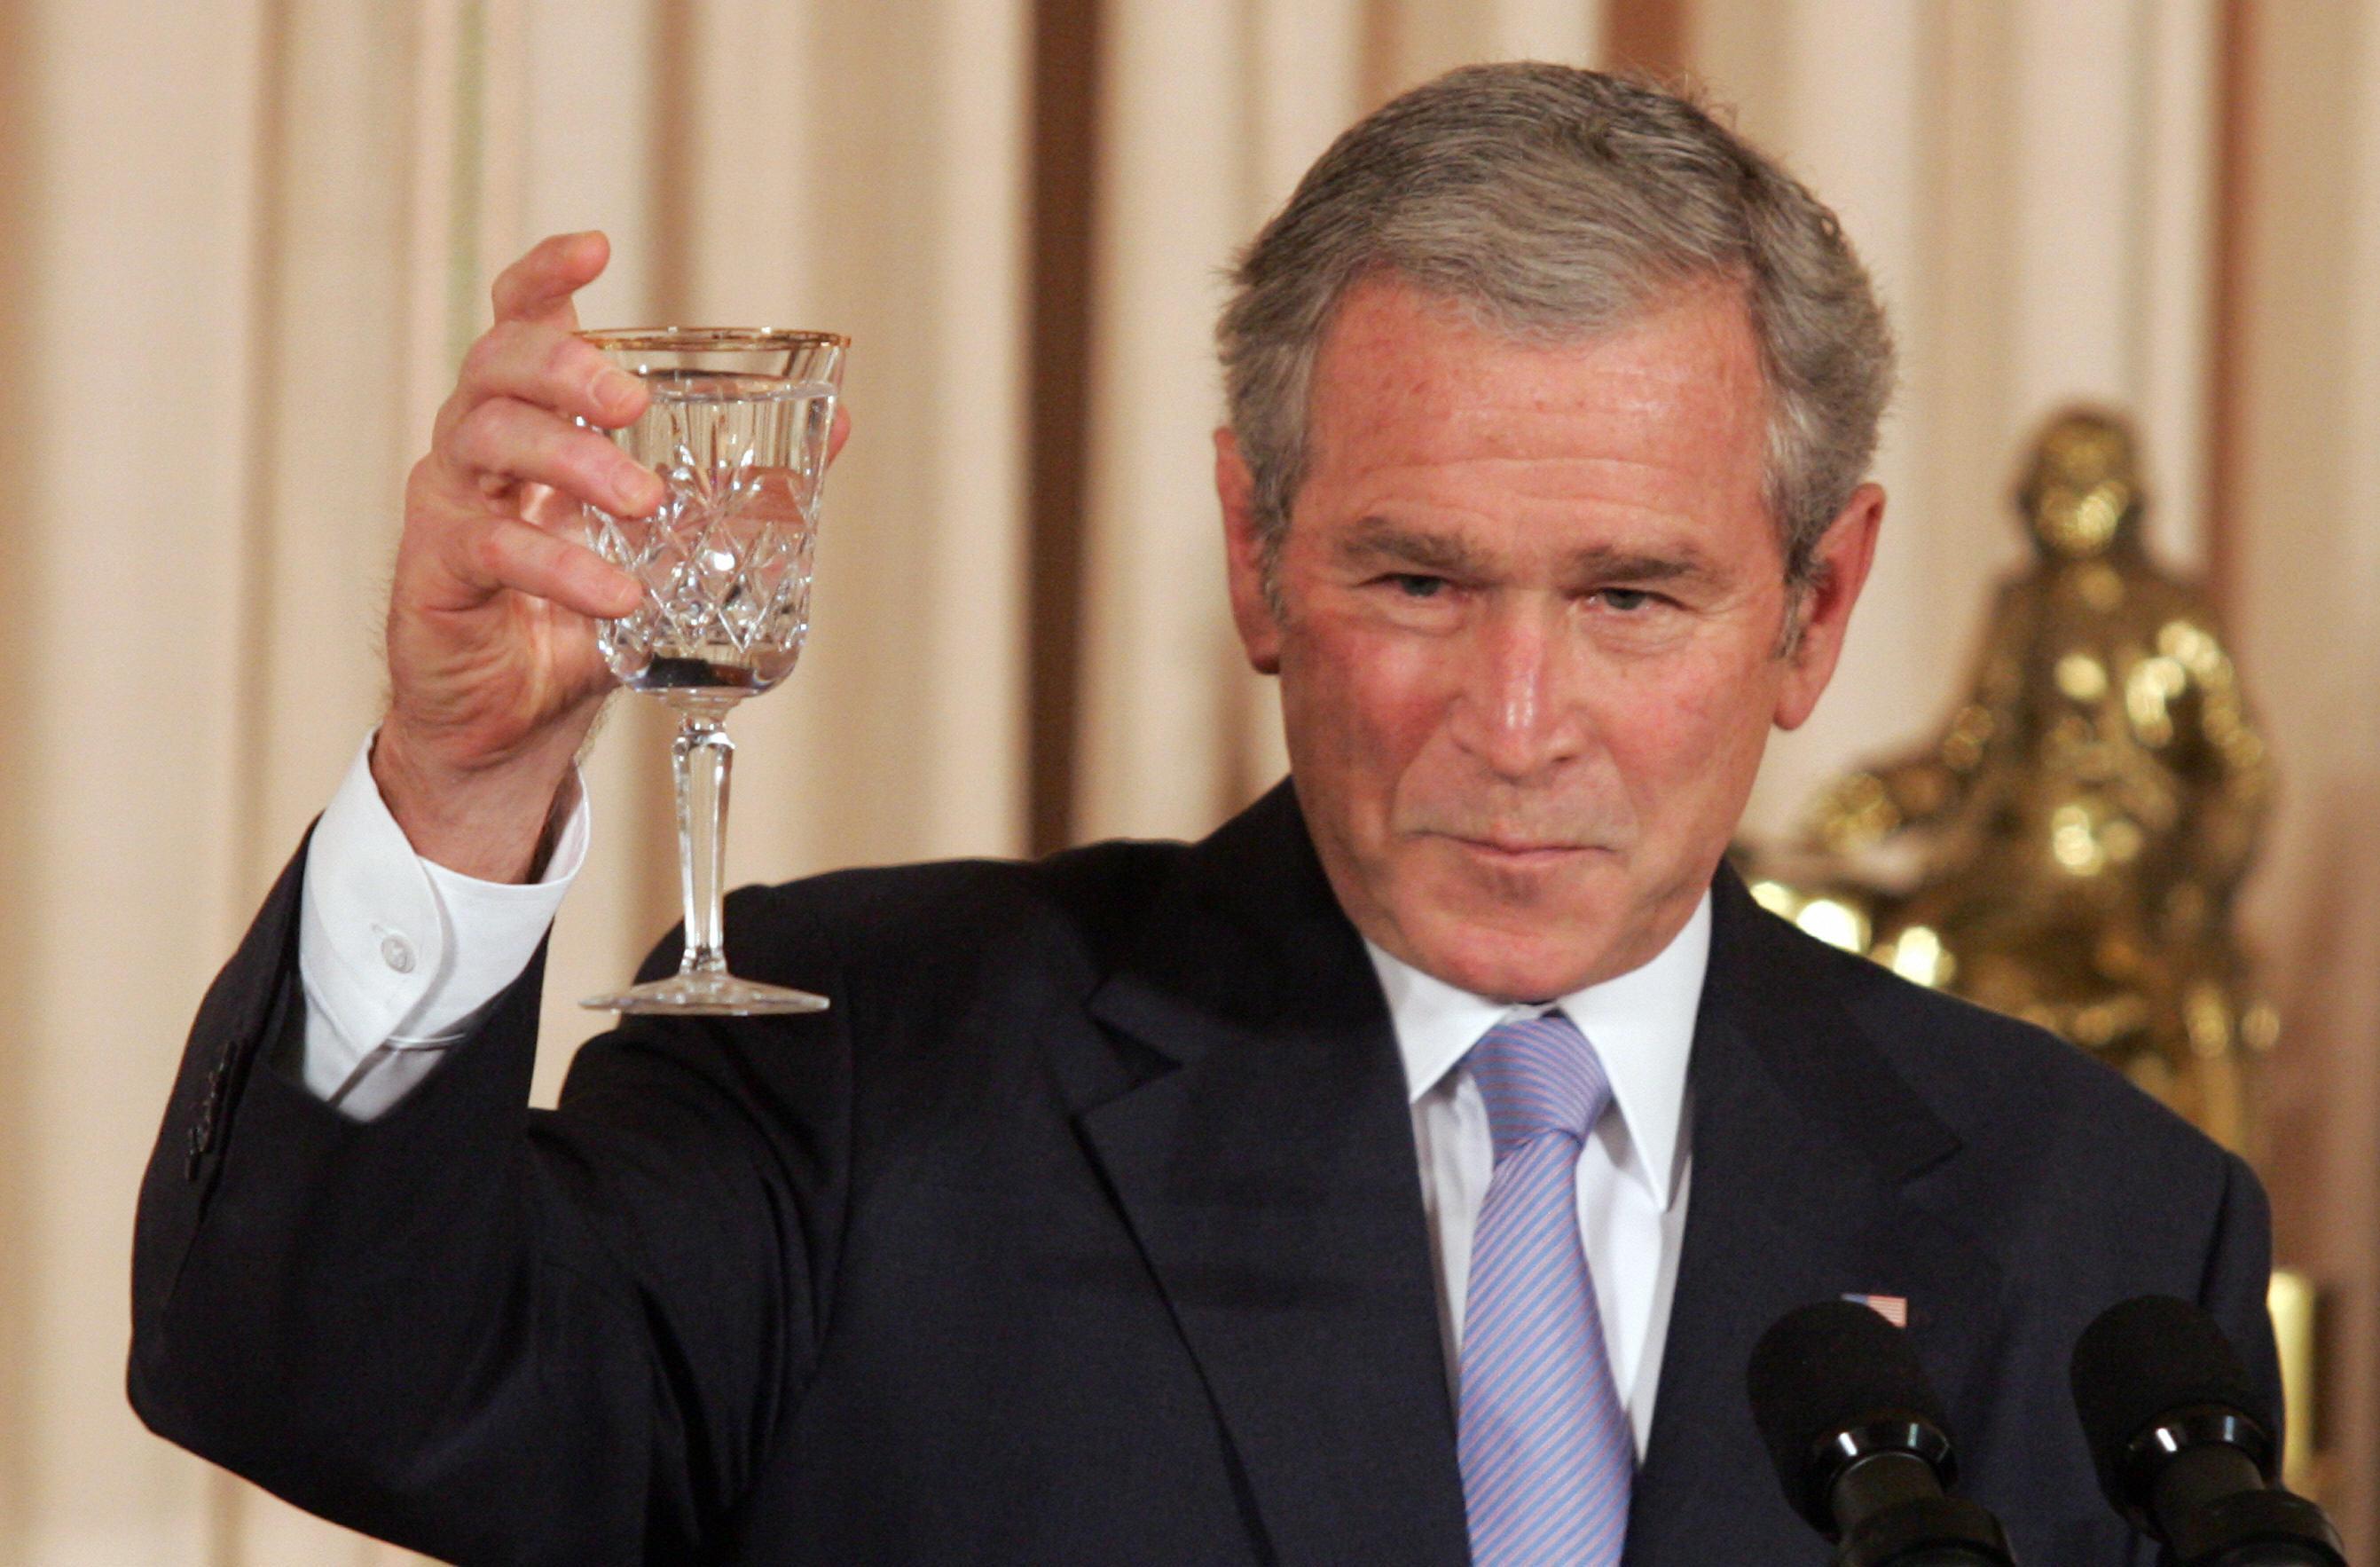 George W Bush Toast Earlthepearl137